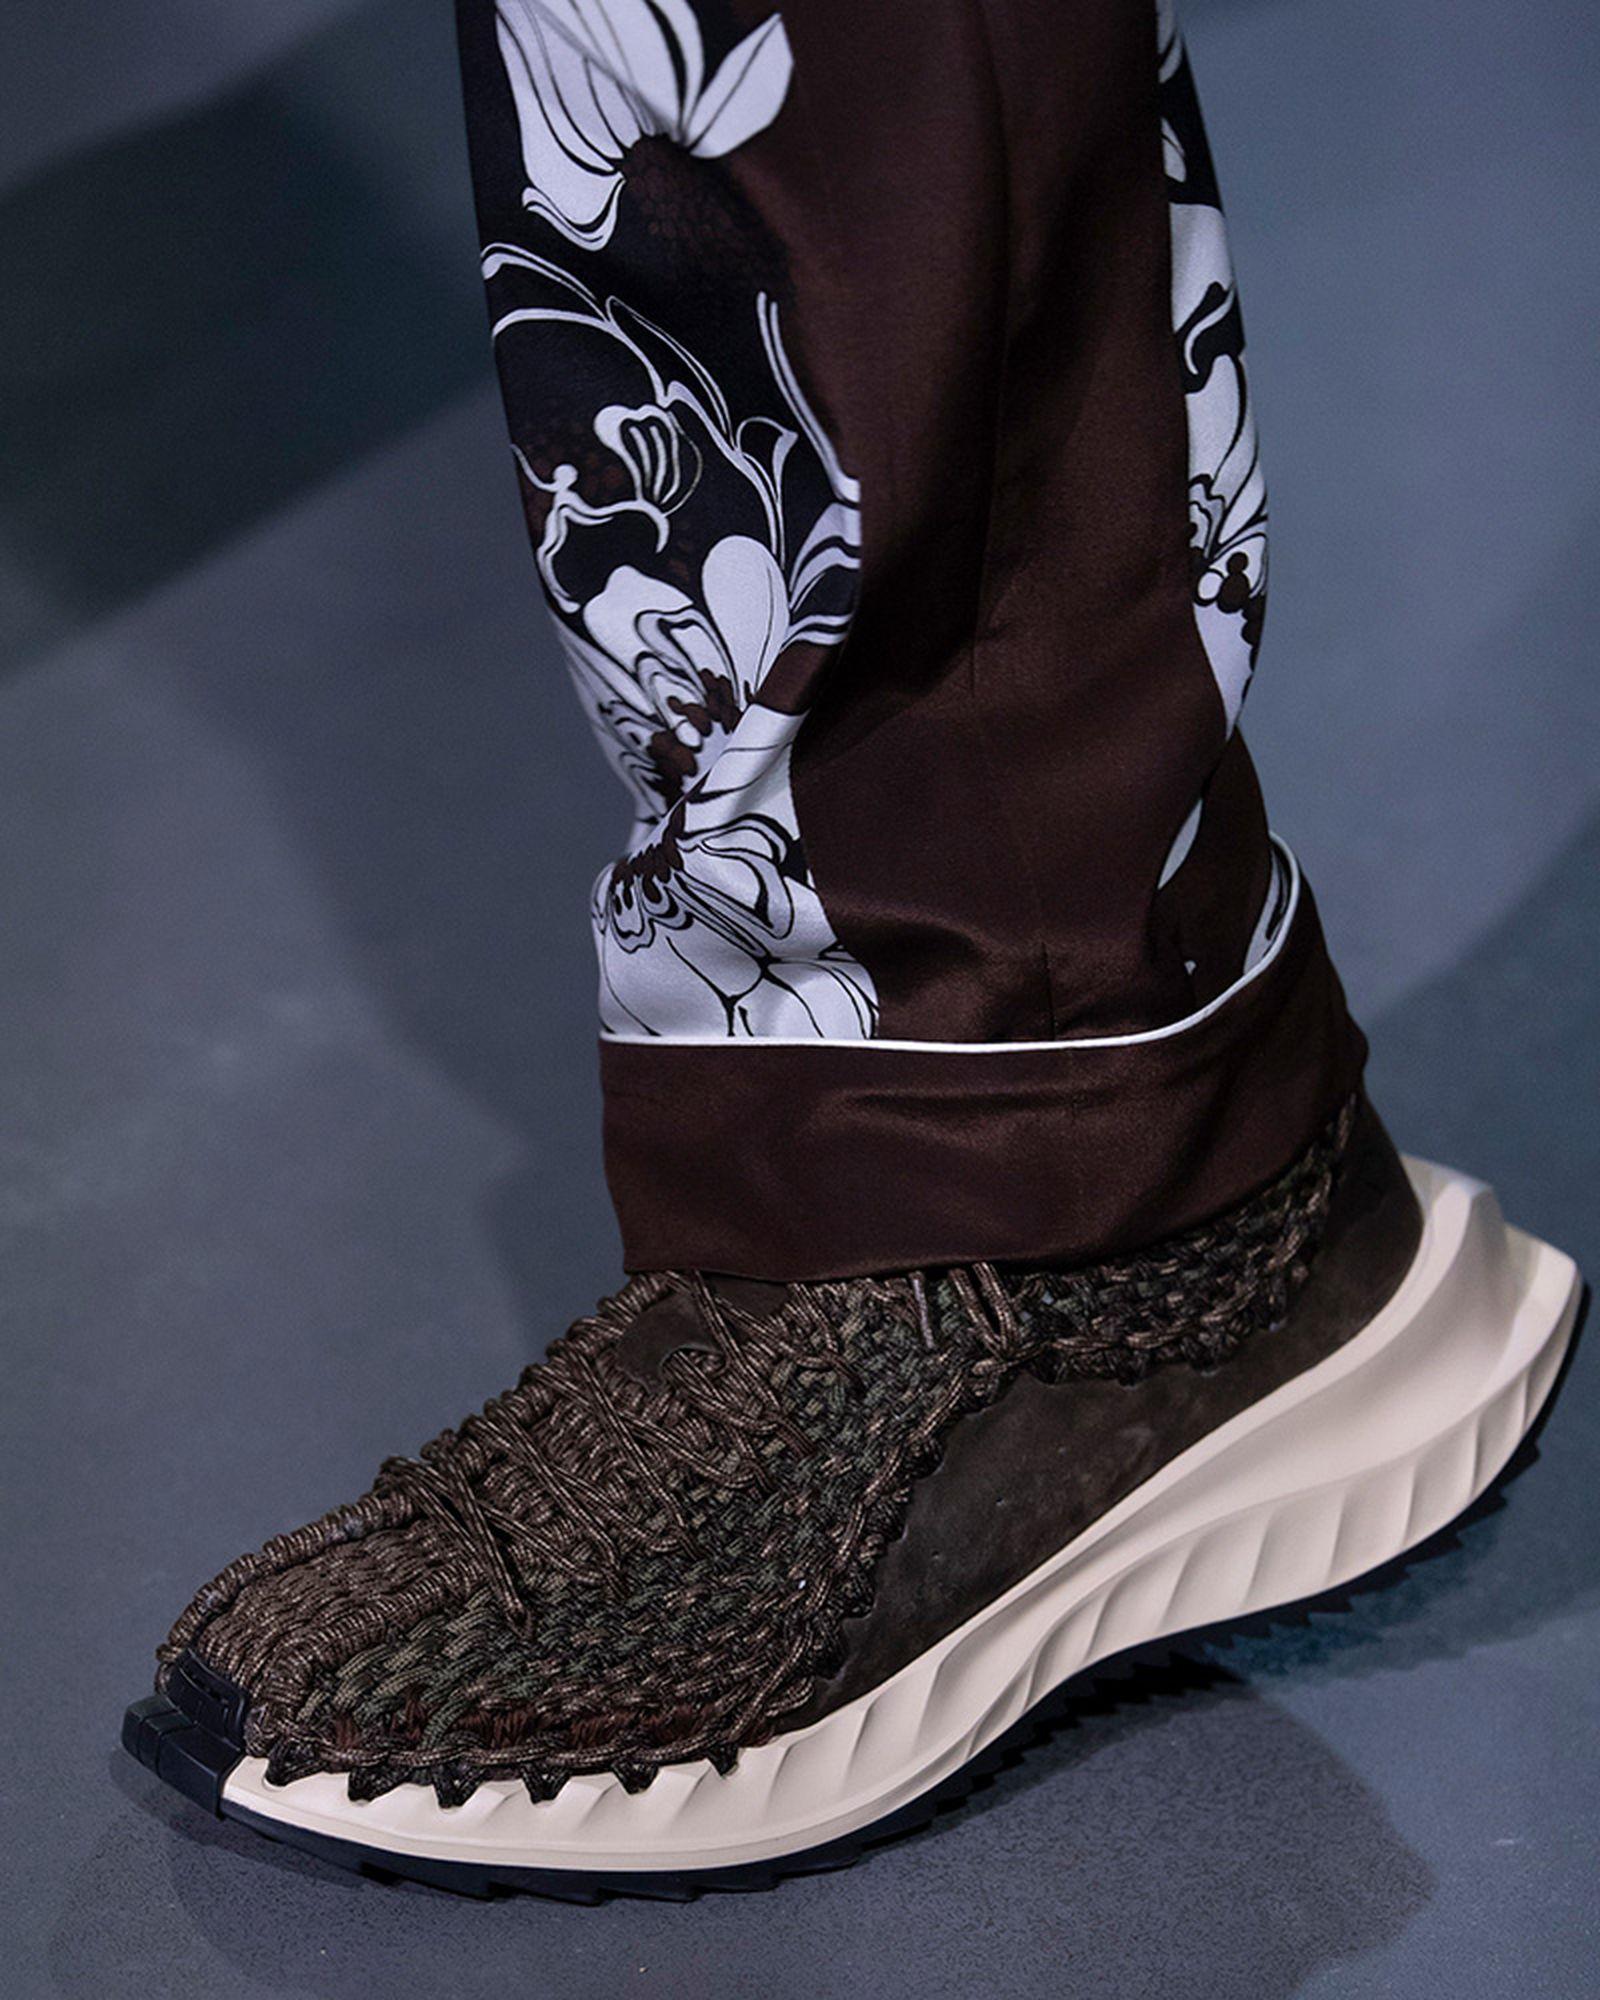 fashion-week-ss22-sneaker-roundup-valentino-01